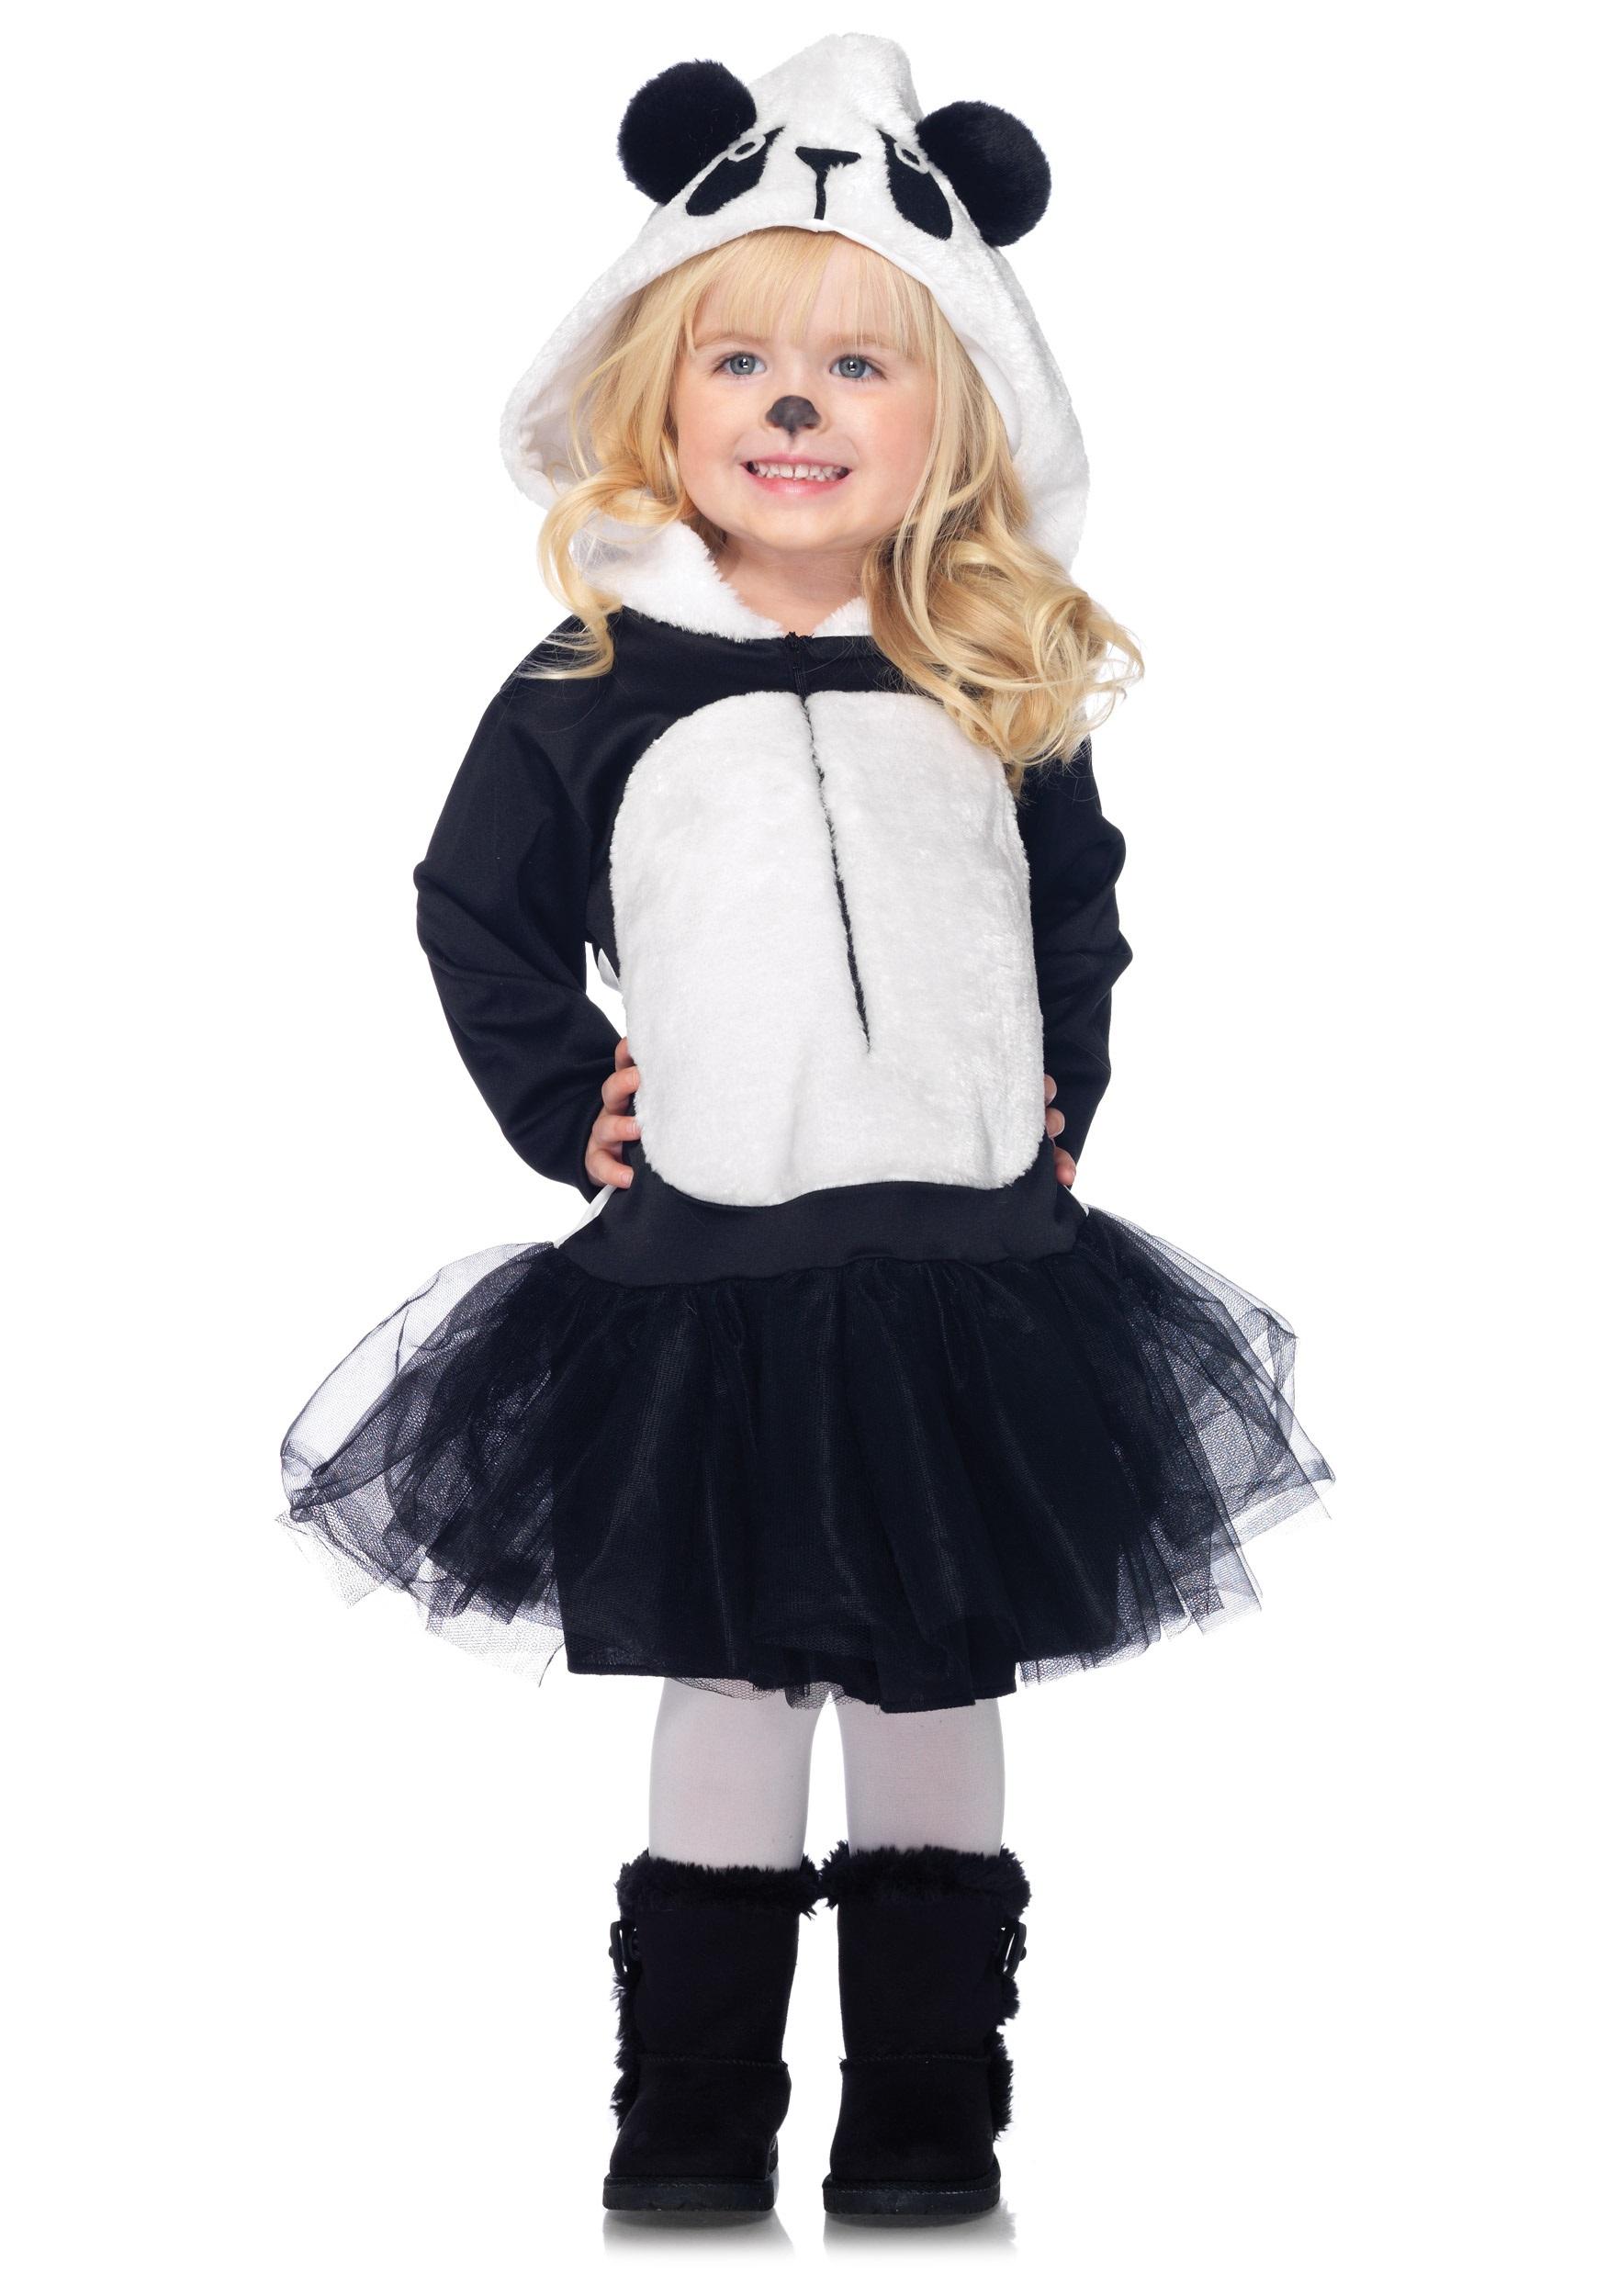 Toddler Precious Panda Costume  sc 1 st  Halloween Costumes & Toddler Precious Panda Costume - Halloween Costumes